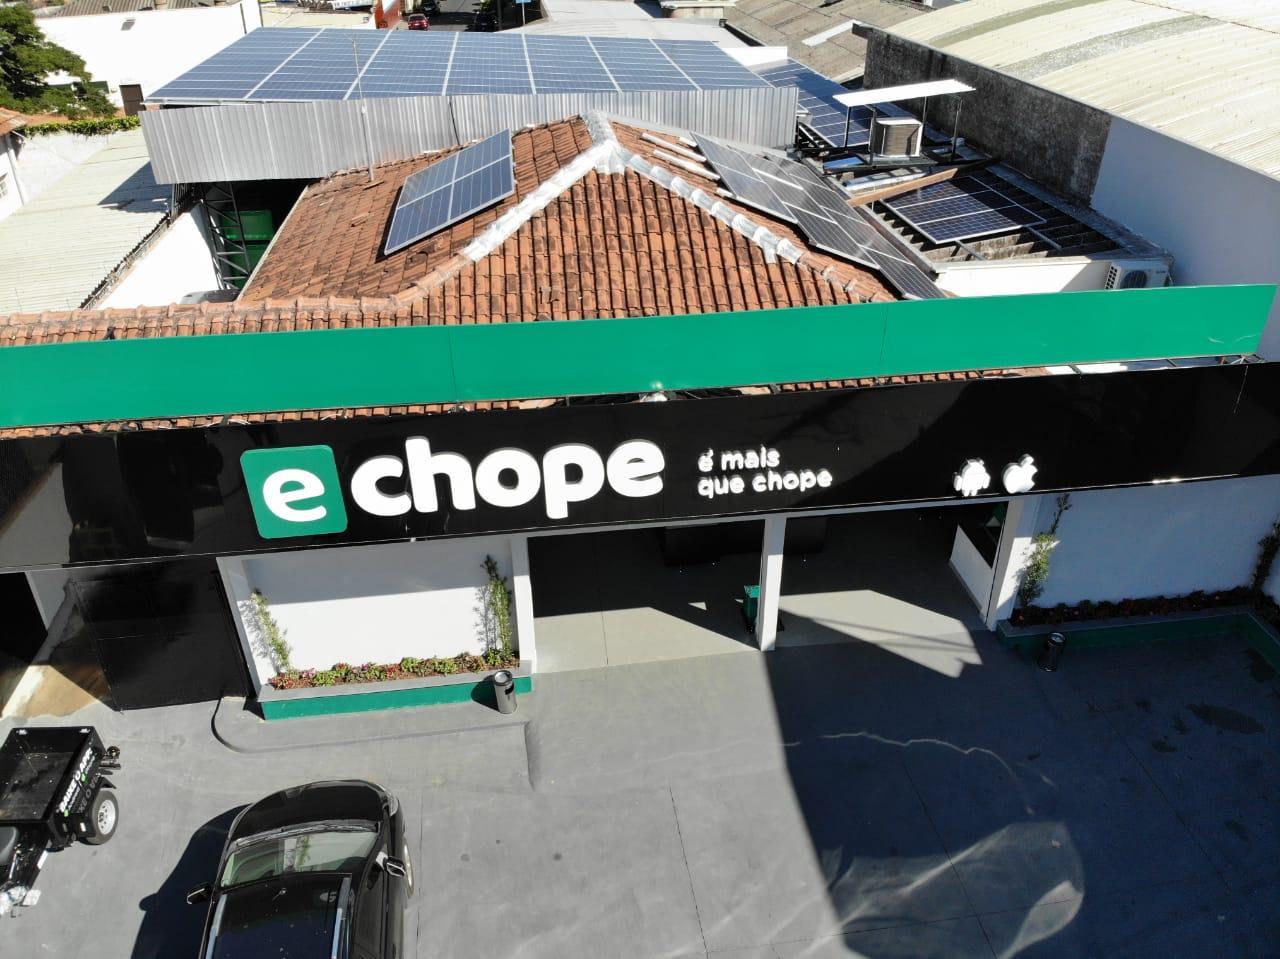 echopp-energia-solar-fotovoltaica-araraquara-sao-carlos-matao4